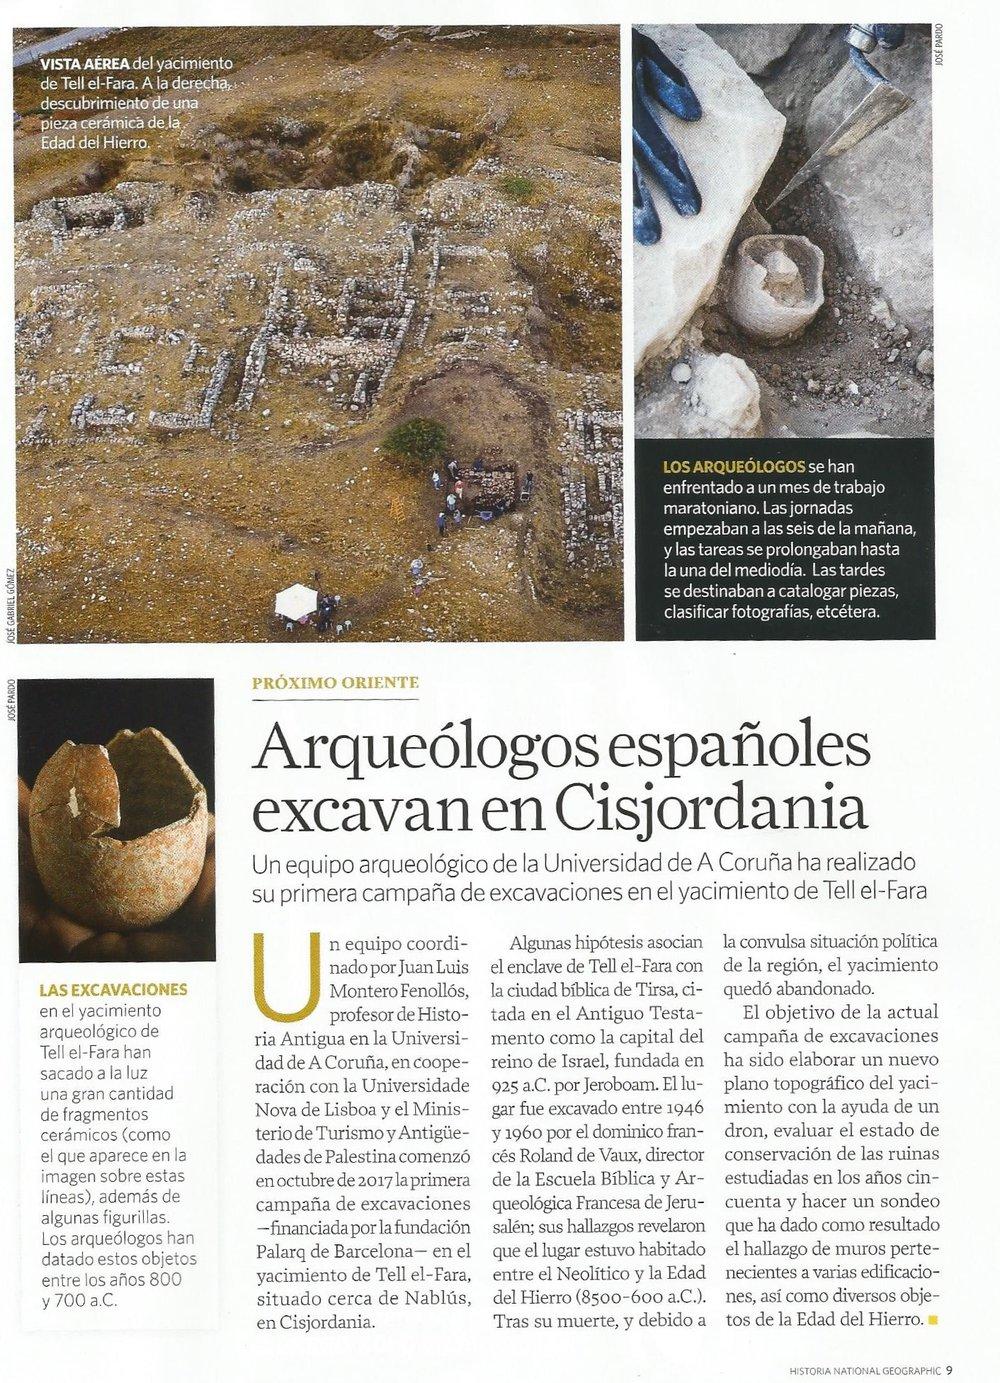 Historia National Geographic - Nº 169, página 92017